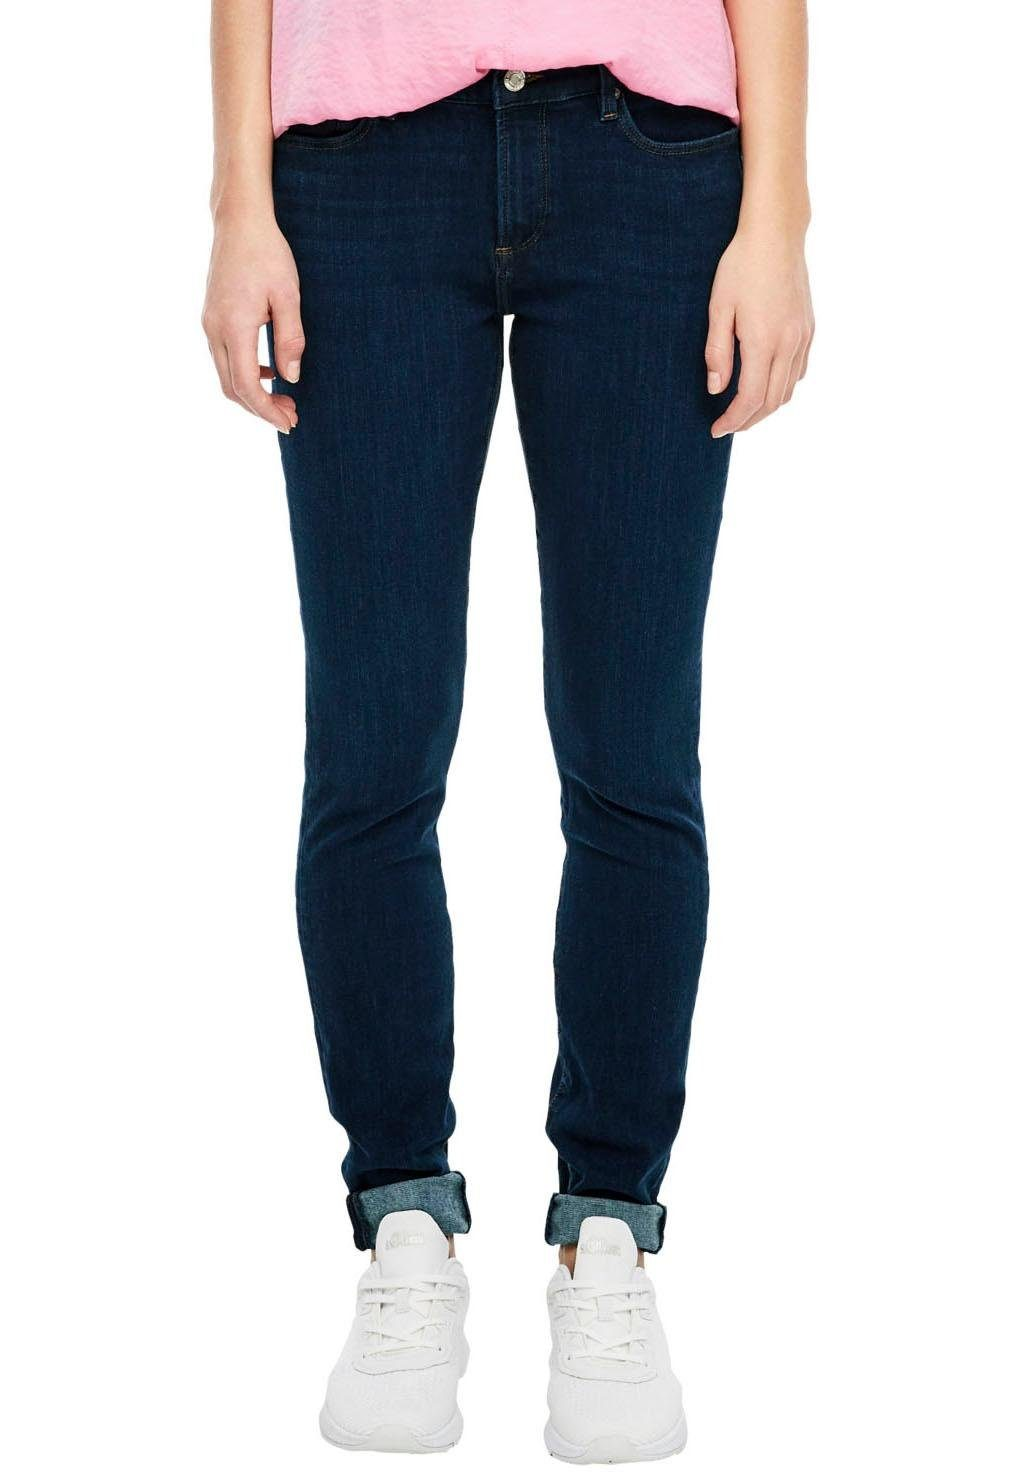 Aniston Jeans 17 Stretch Röhrenjeans 34 Denim Used Blau Damen Hose Sterne NEU